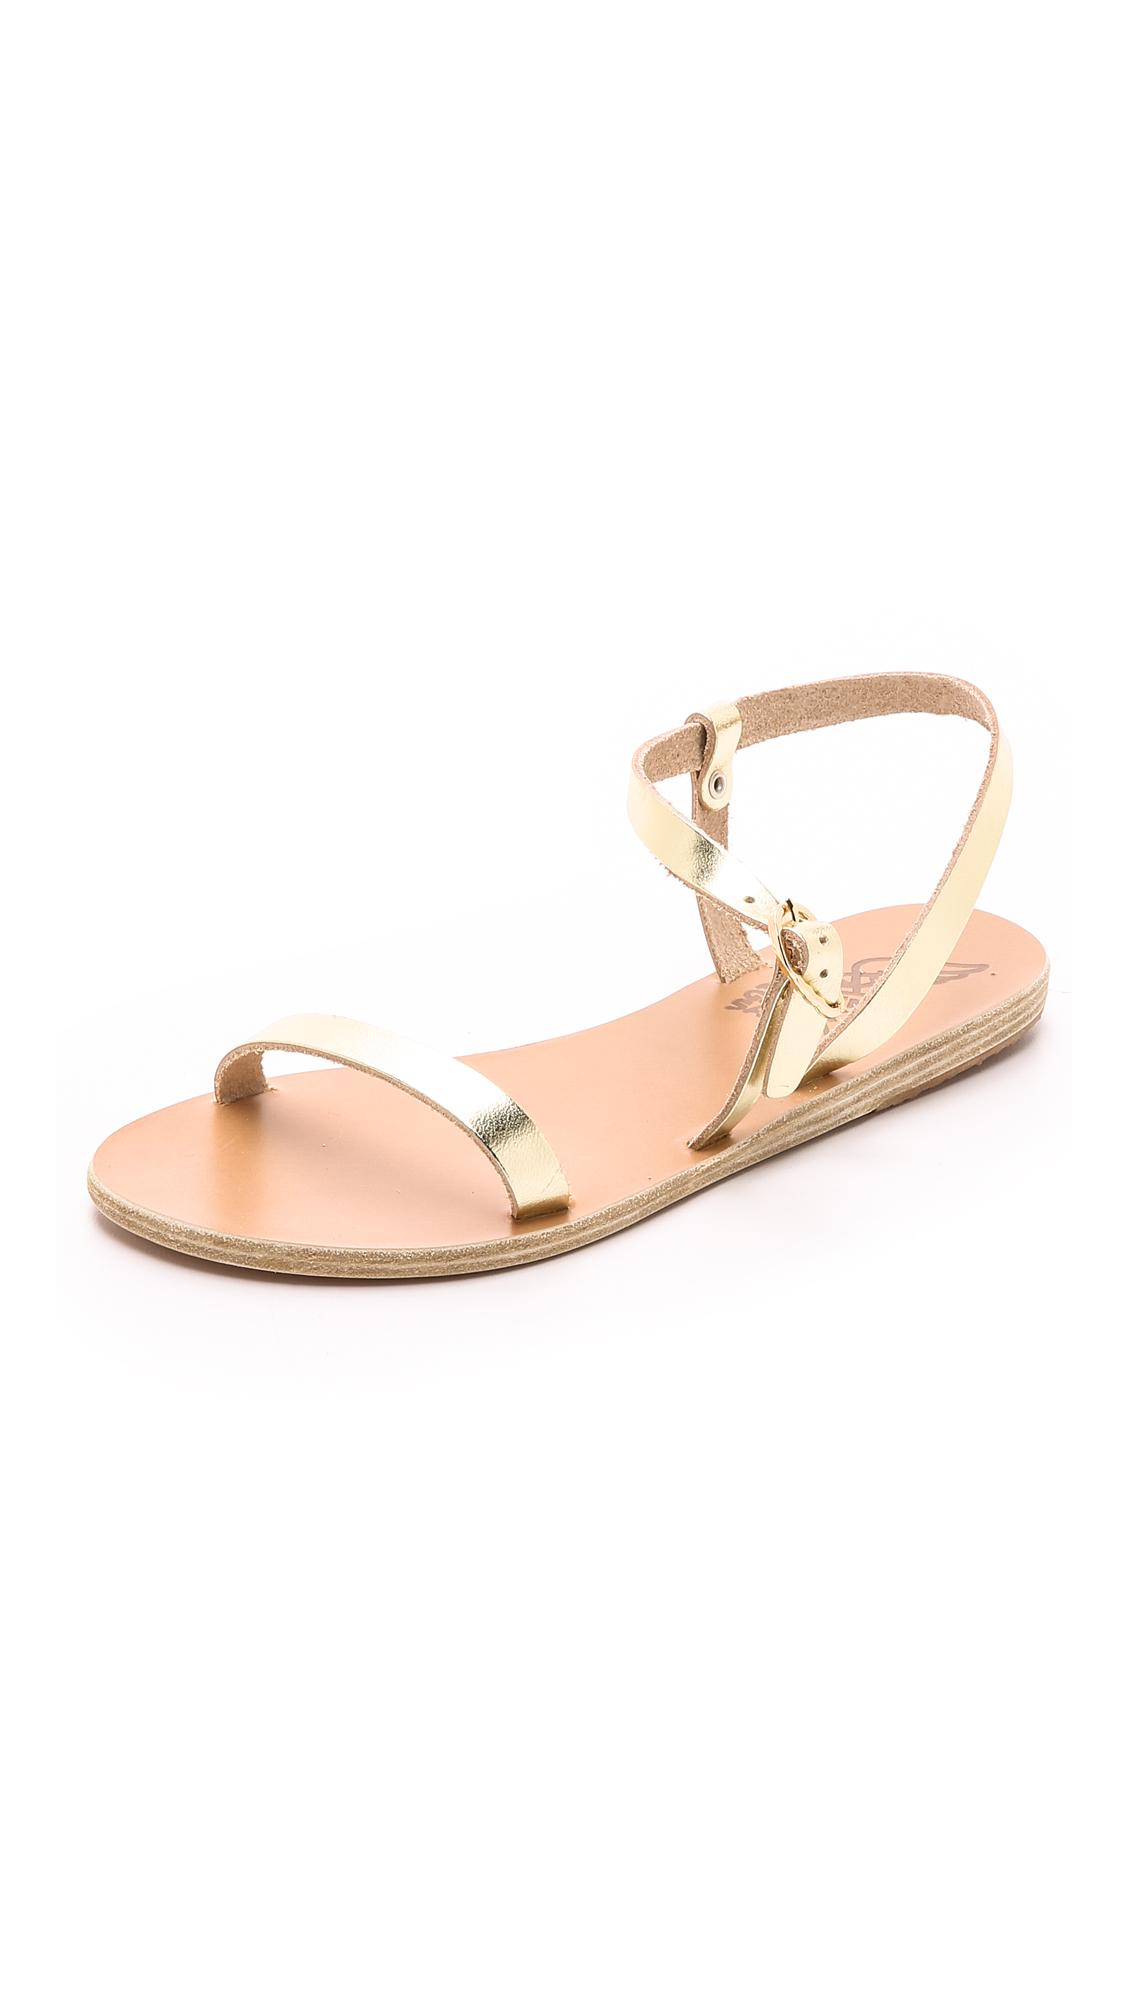 Ancient Greek Sandals Niove Sandals - Platinum at Shopbop